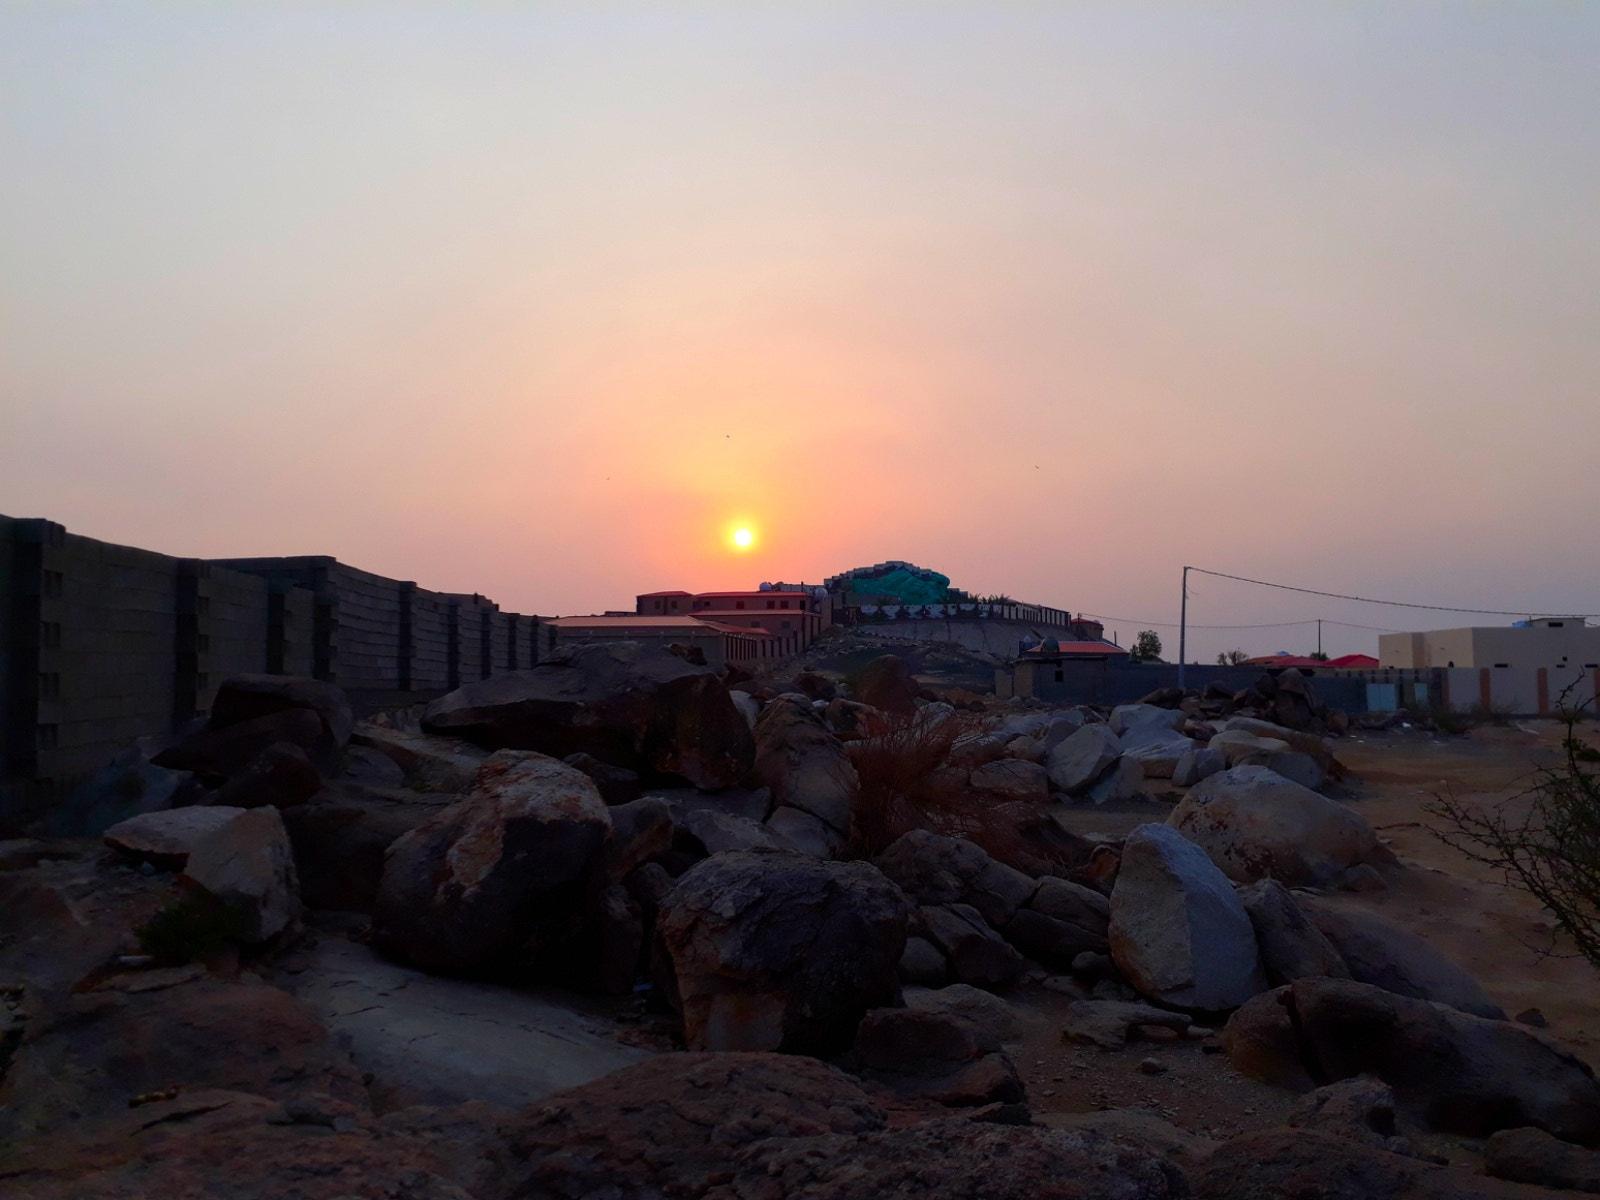 Sunset of Makkah